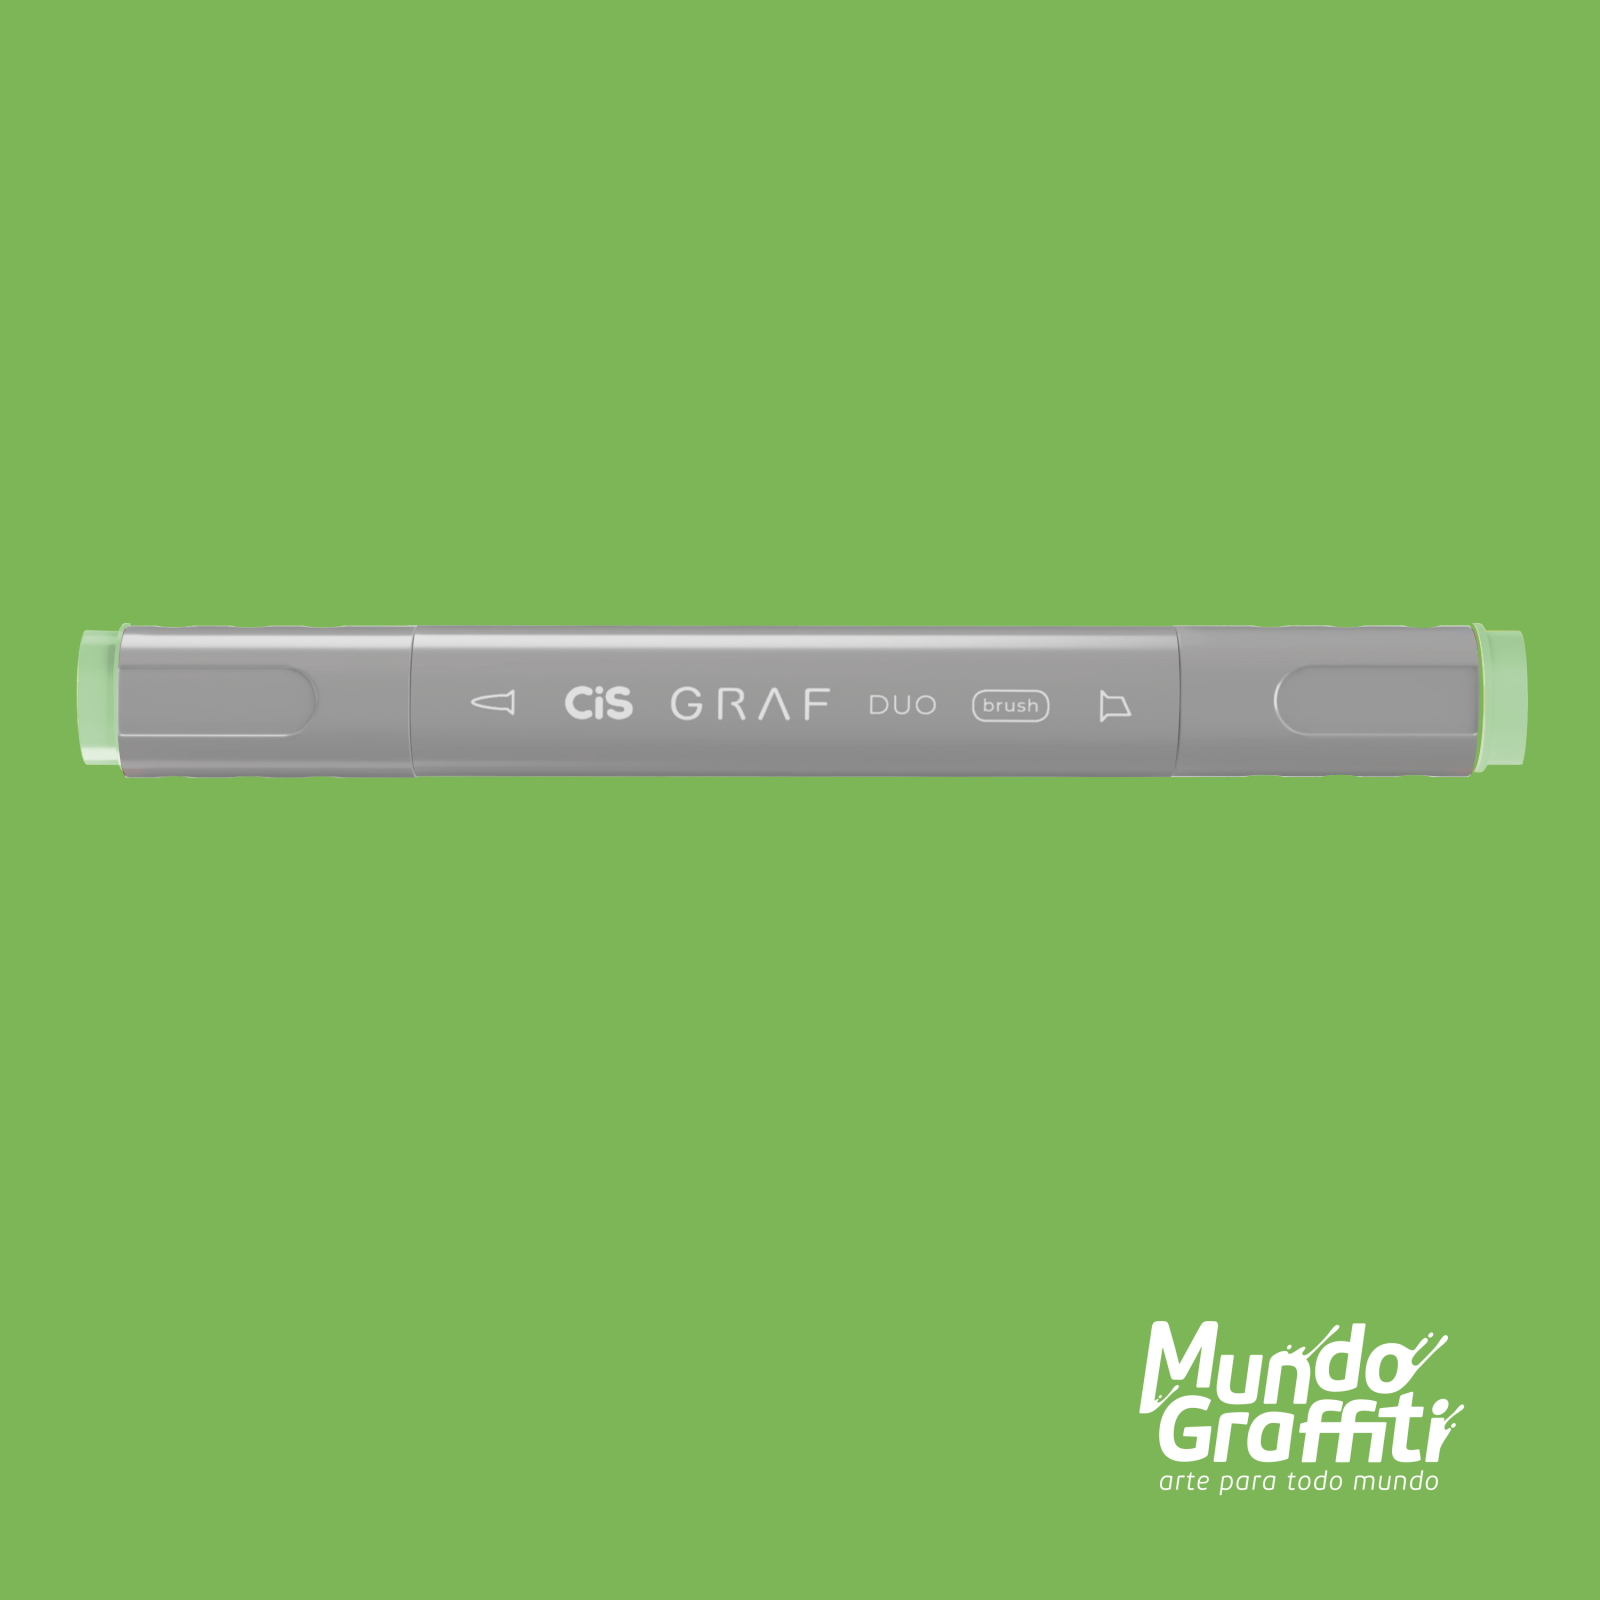 Marcador Cis Graf Duo Brush Pale Green 59 - Mundo Graffiti